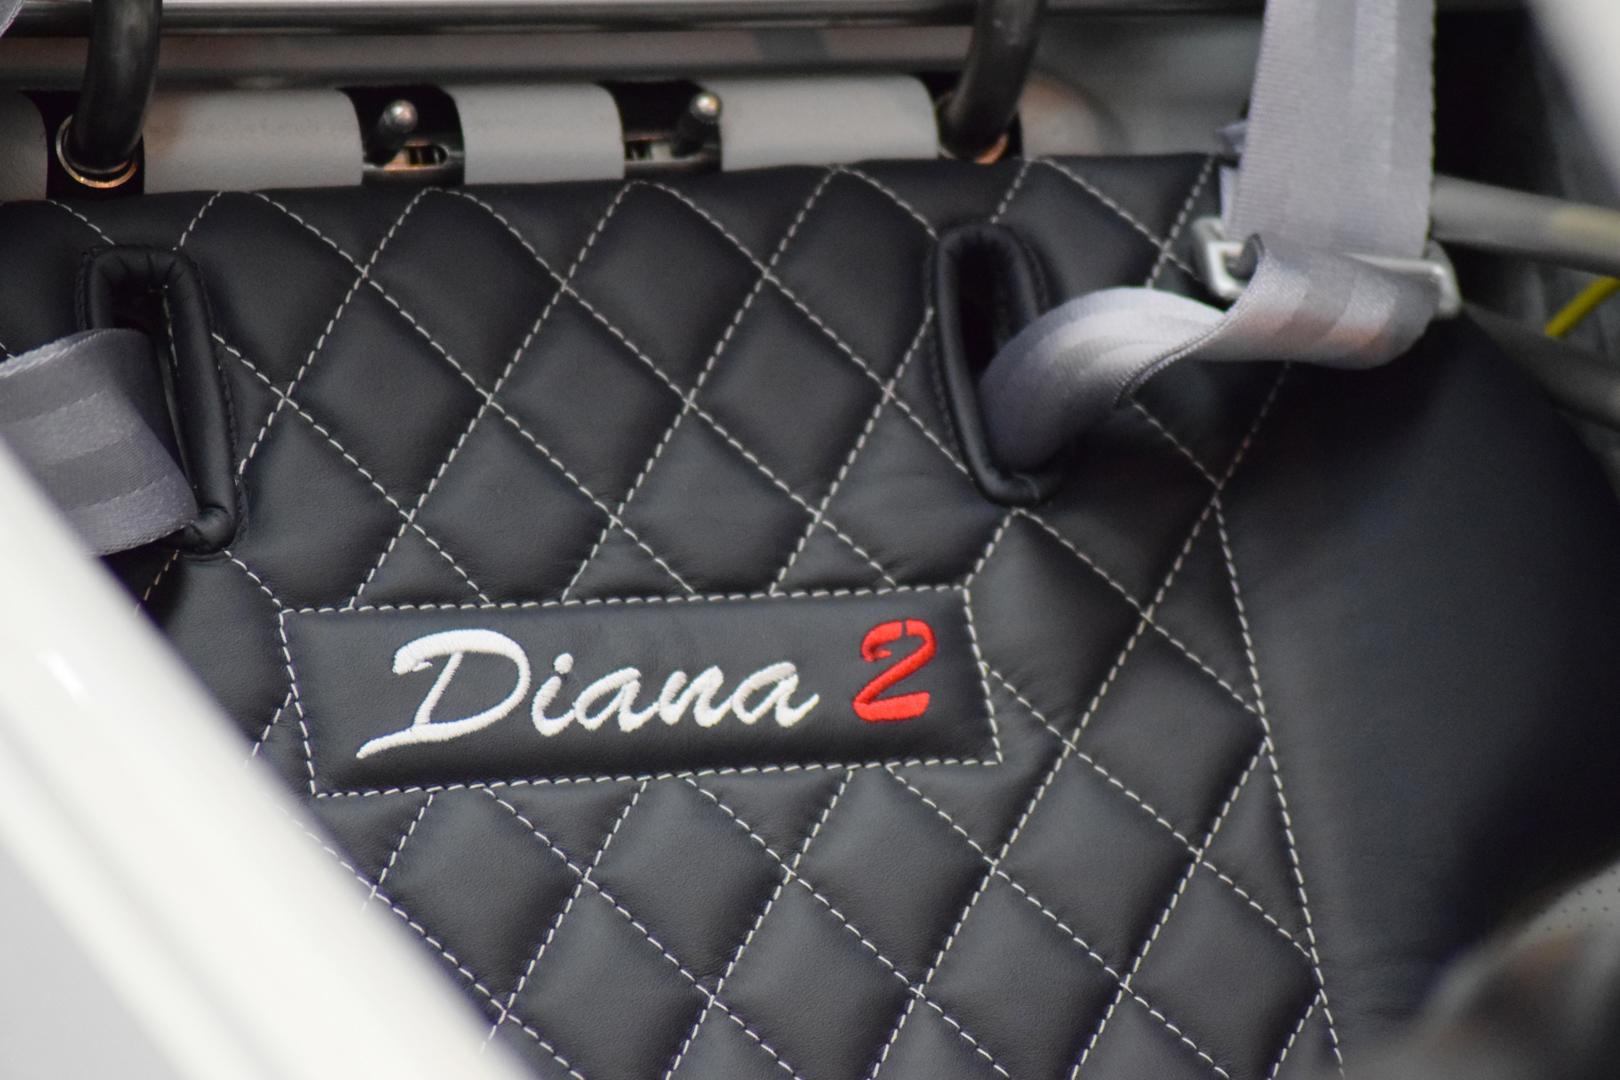 Diana 2